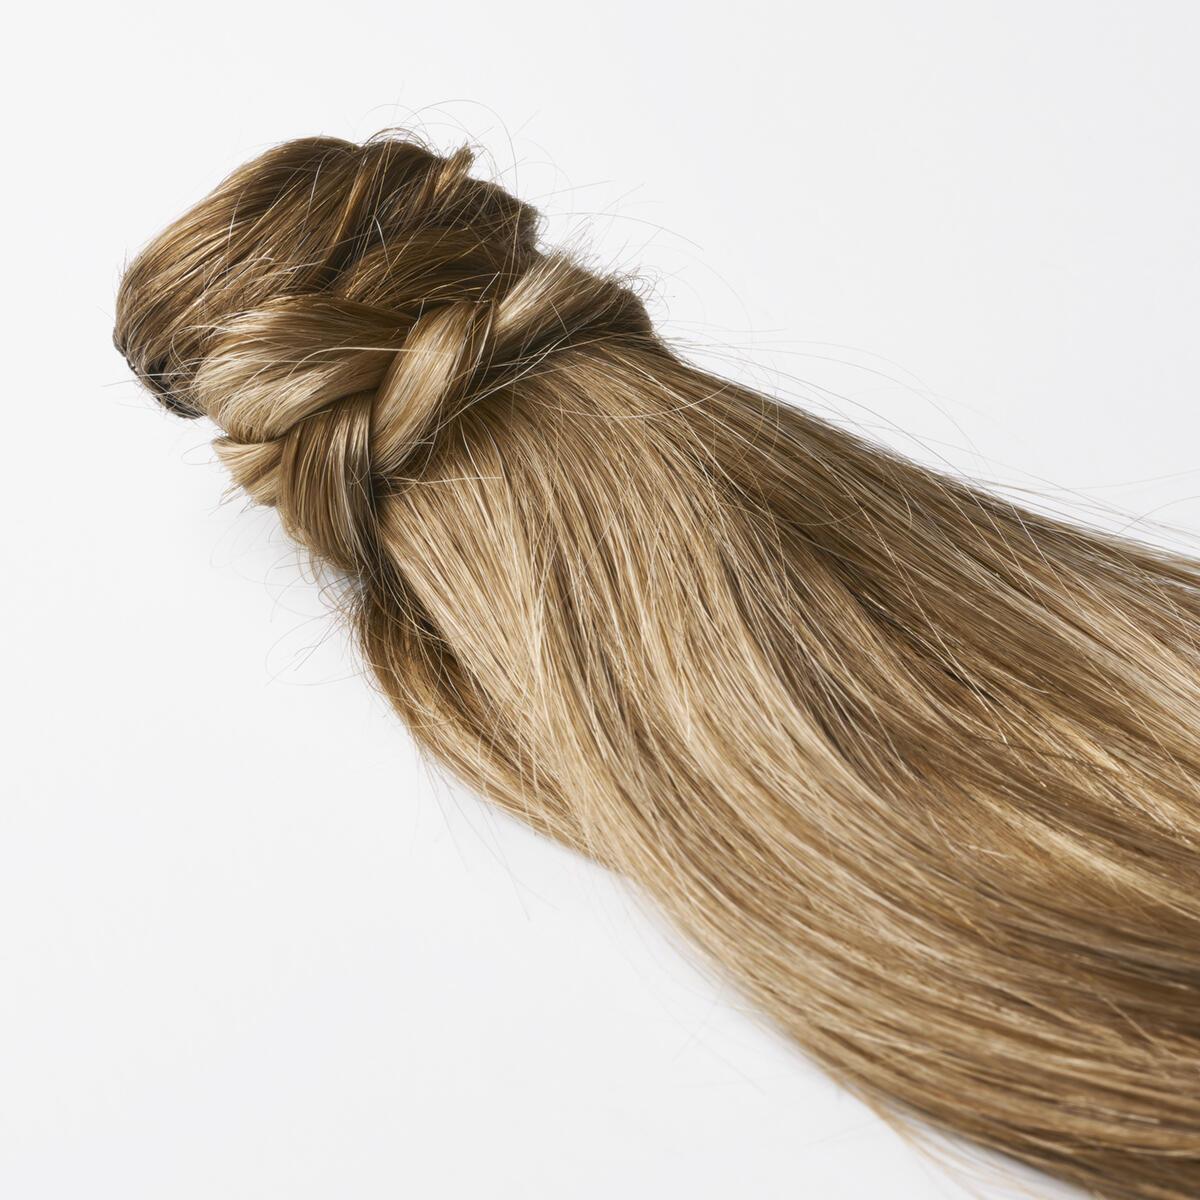 Clip-in Ponytail Ponytail made of real hair B5.0/8.3 Brownish Blonde Balayage 50 cm